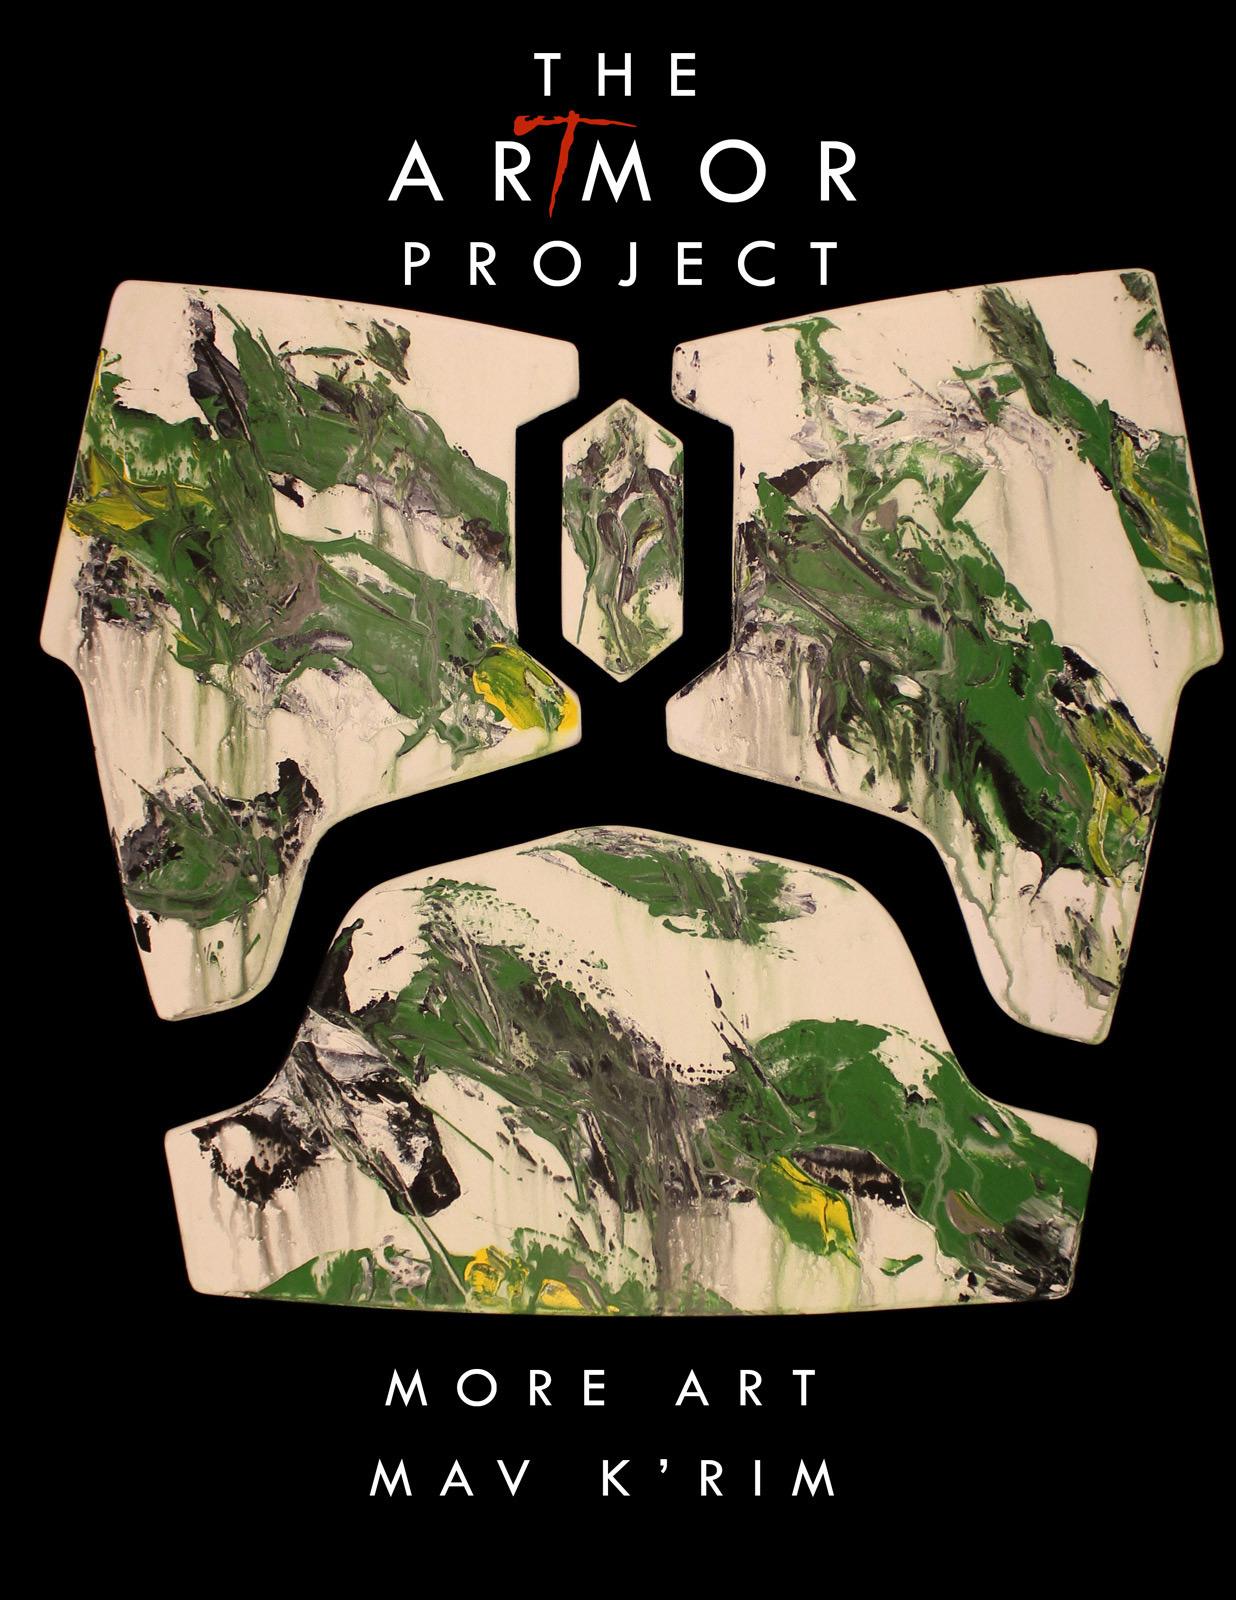 ArTmor 2015: More Art